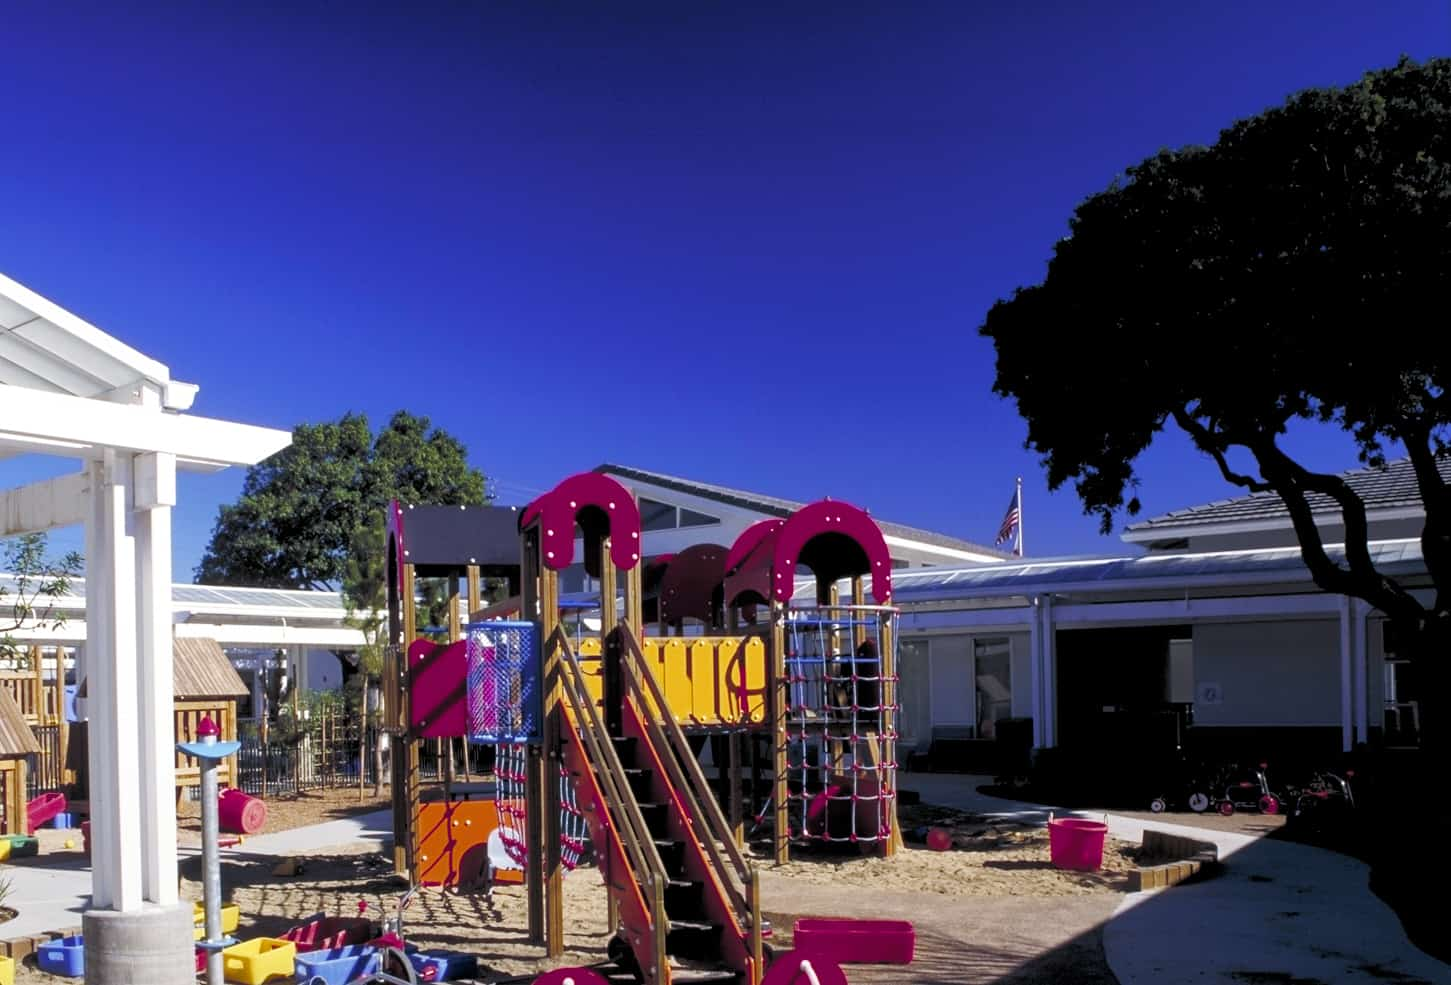 ucla-child-care-center-1